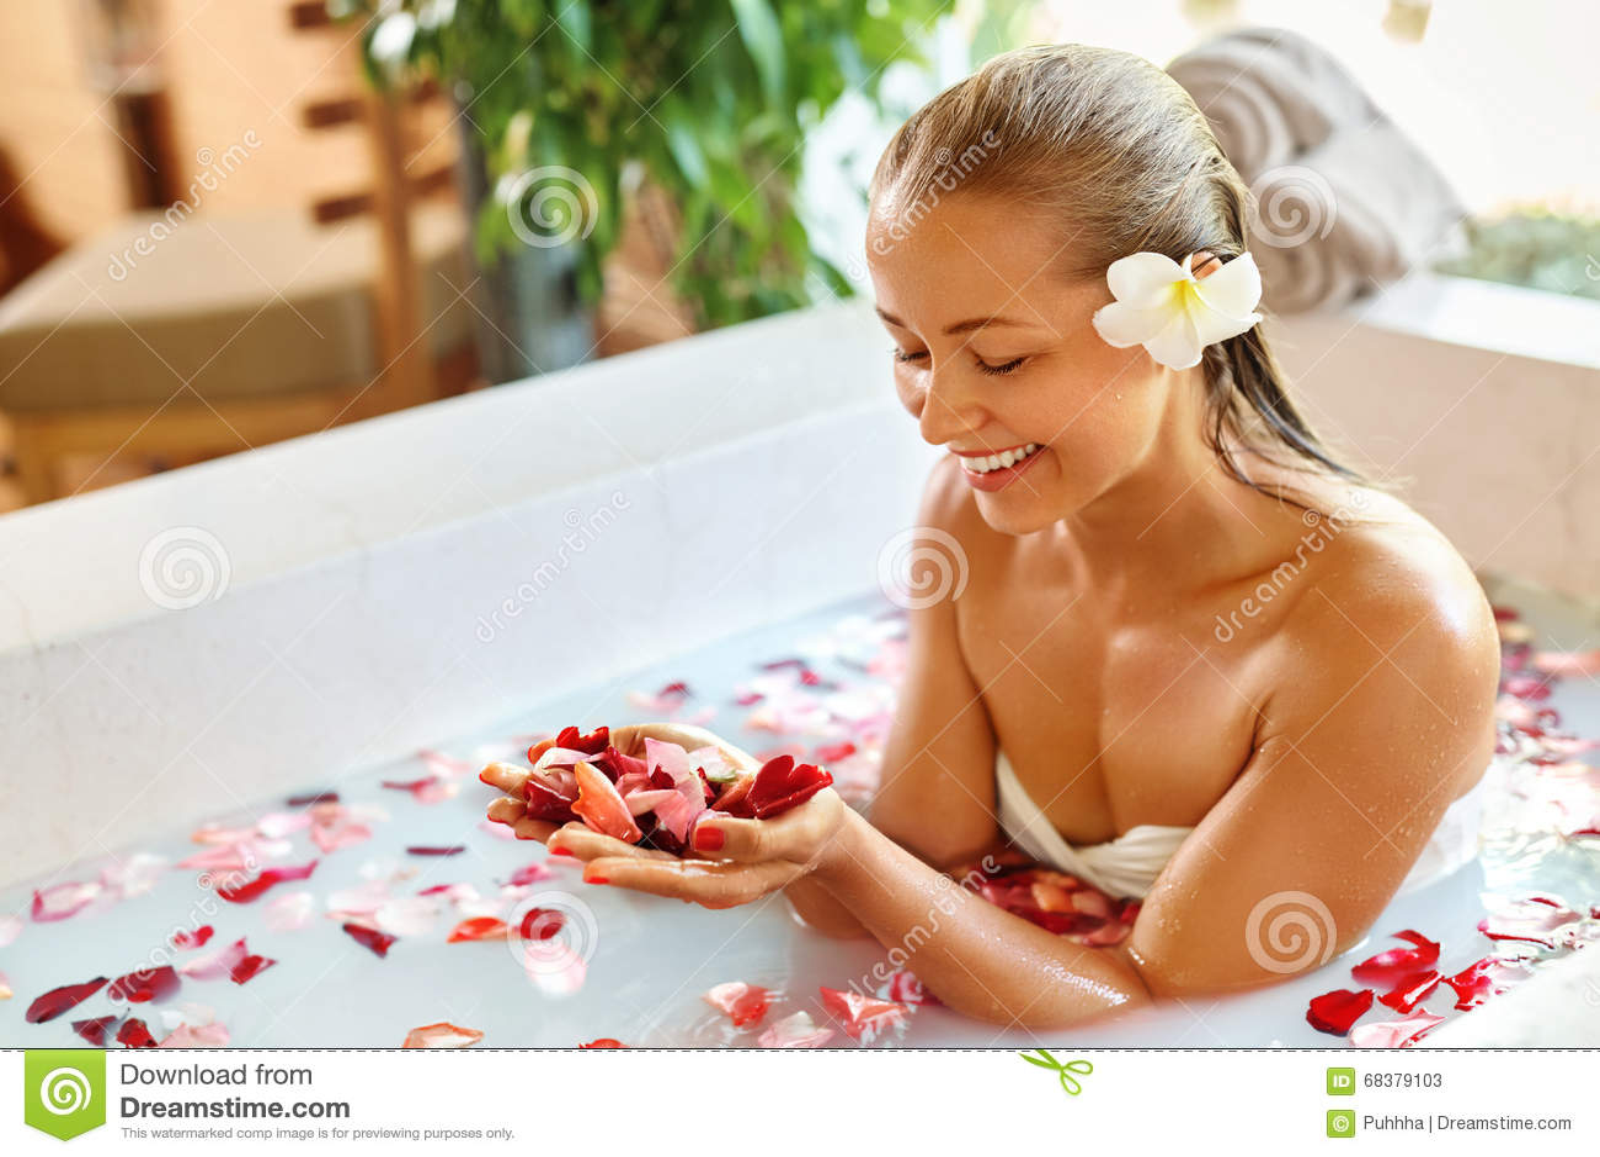 434aaaa219603 woman-body-care-spa-rose-flower-bath -treatment-aromatherapy-petals-close-up-sexy-blonde-female-bikini -taking-resort-68379103.jpg